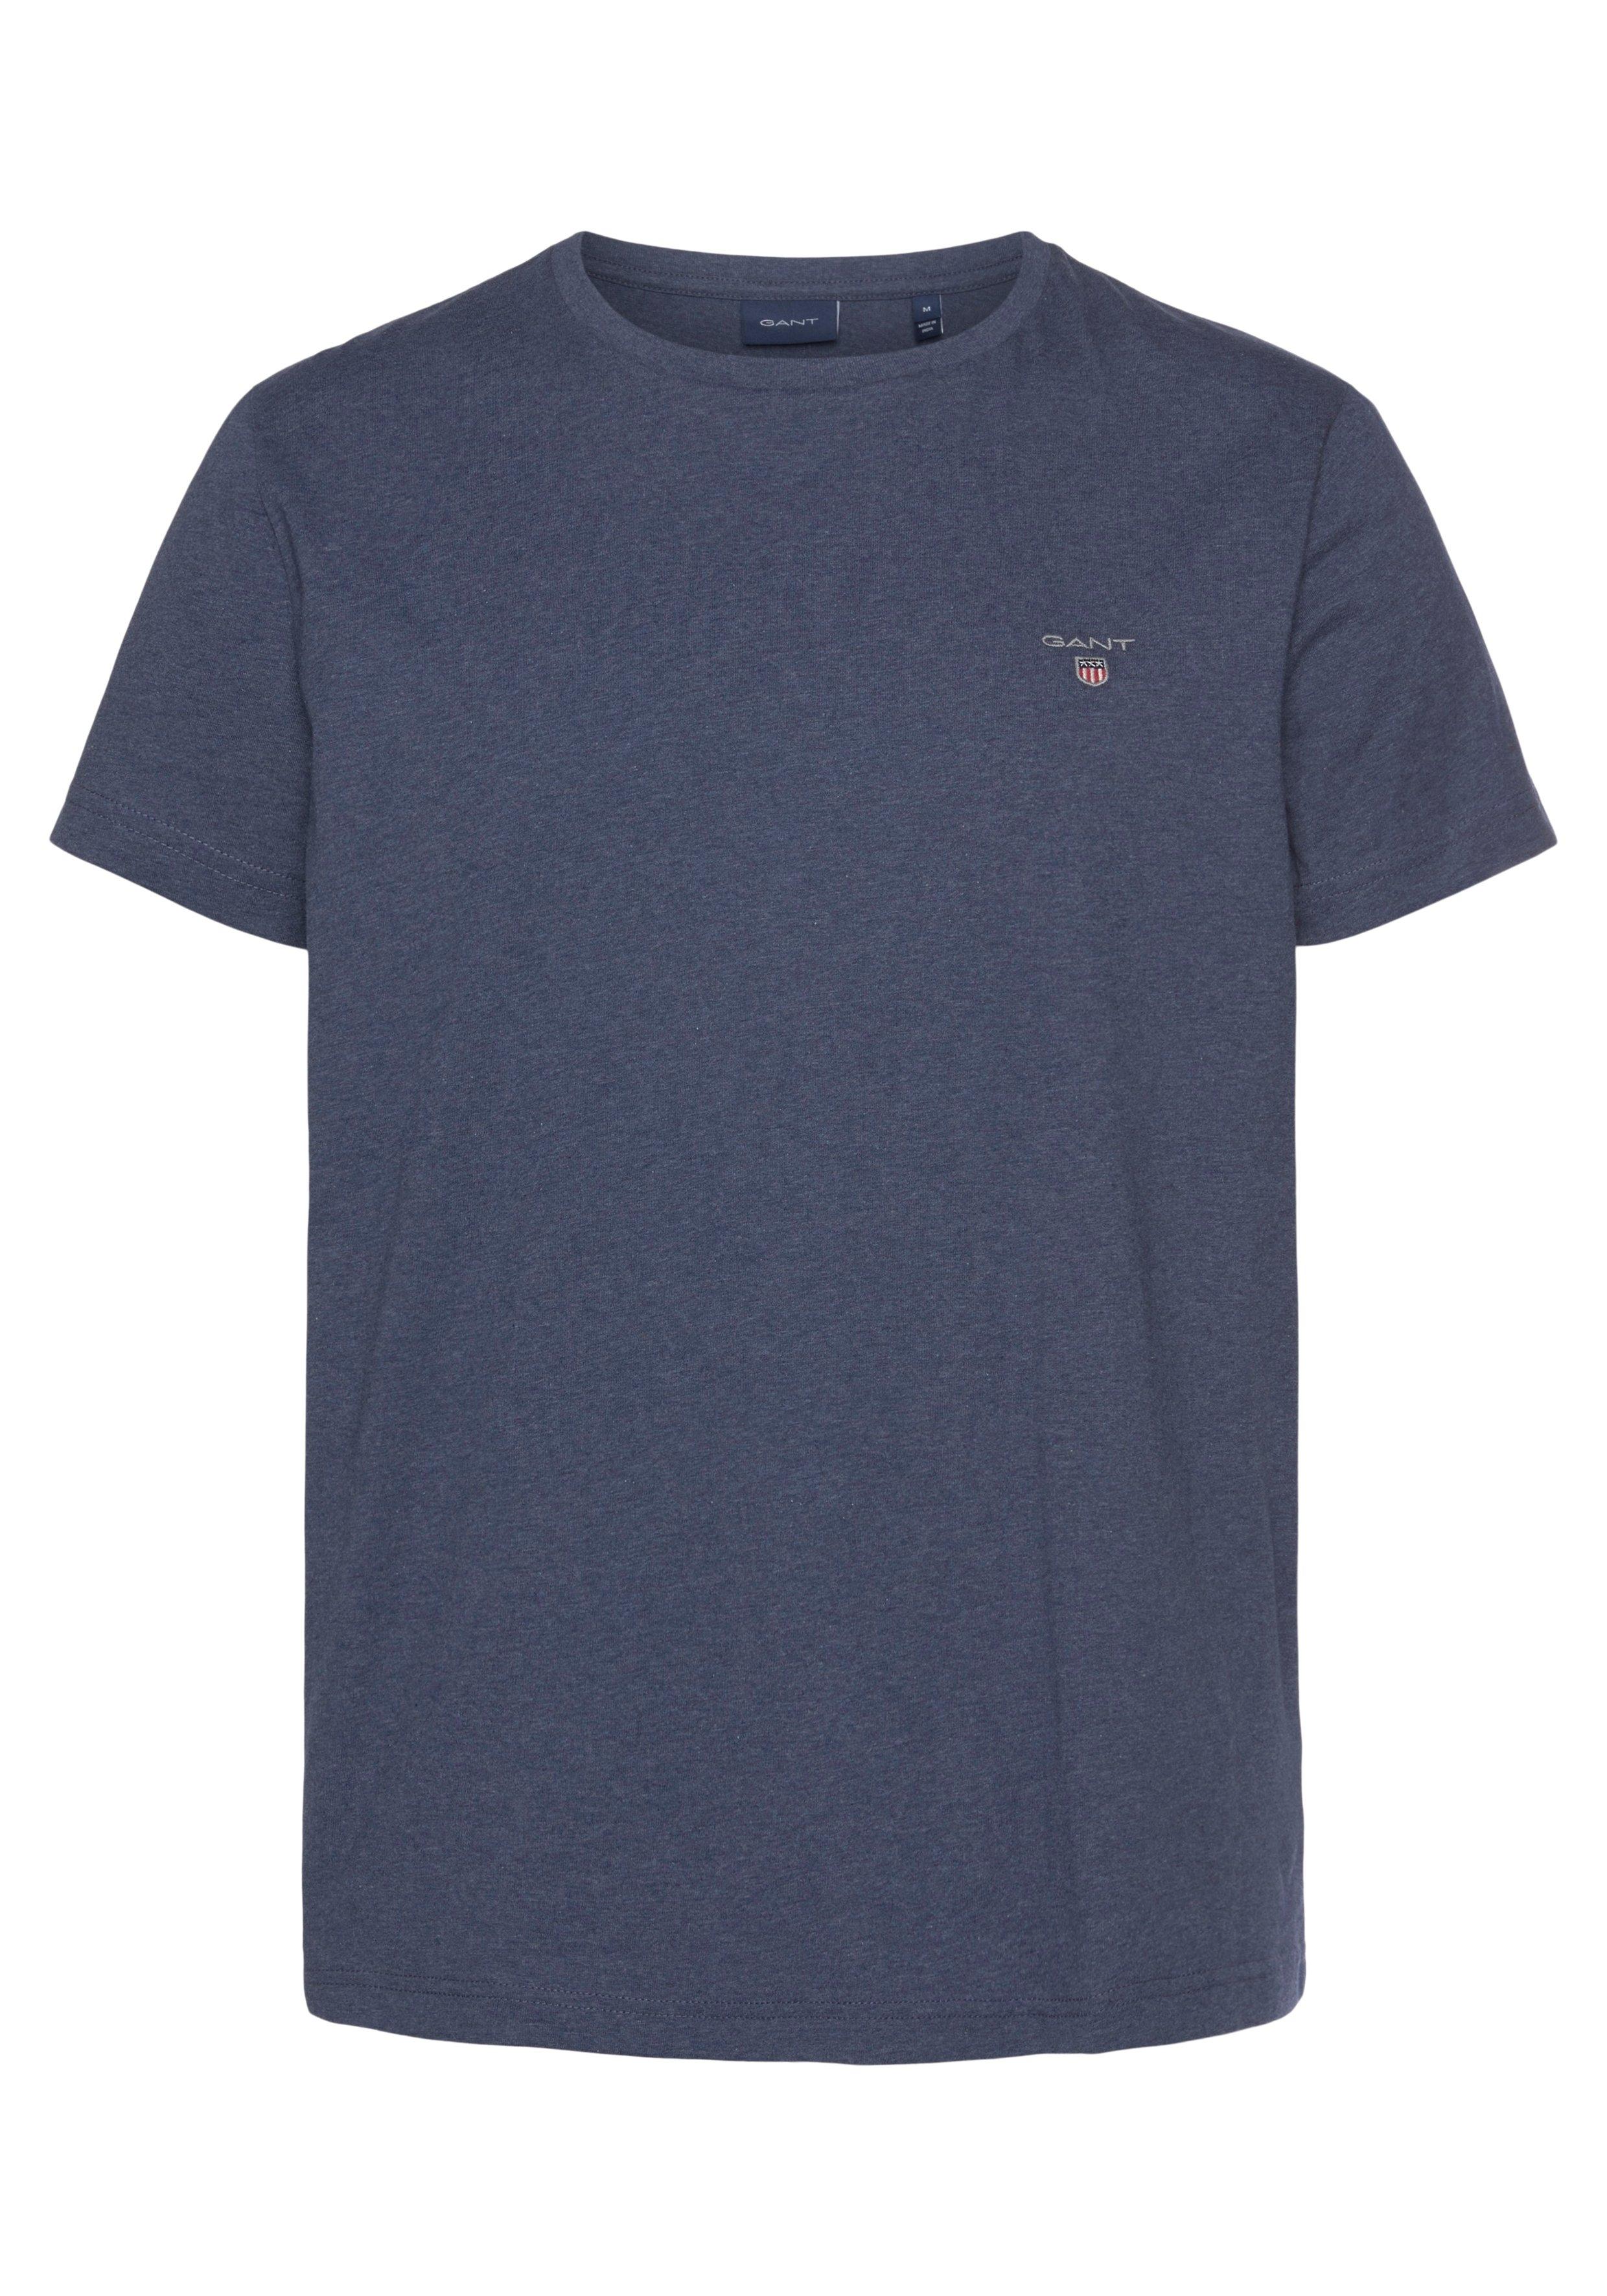 Gant T-shirt klein contrast-logoborduursel online kopen op otto.nl